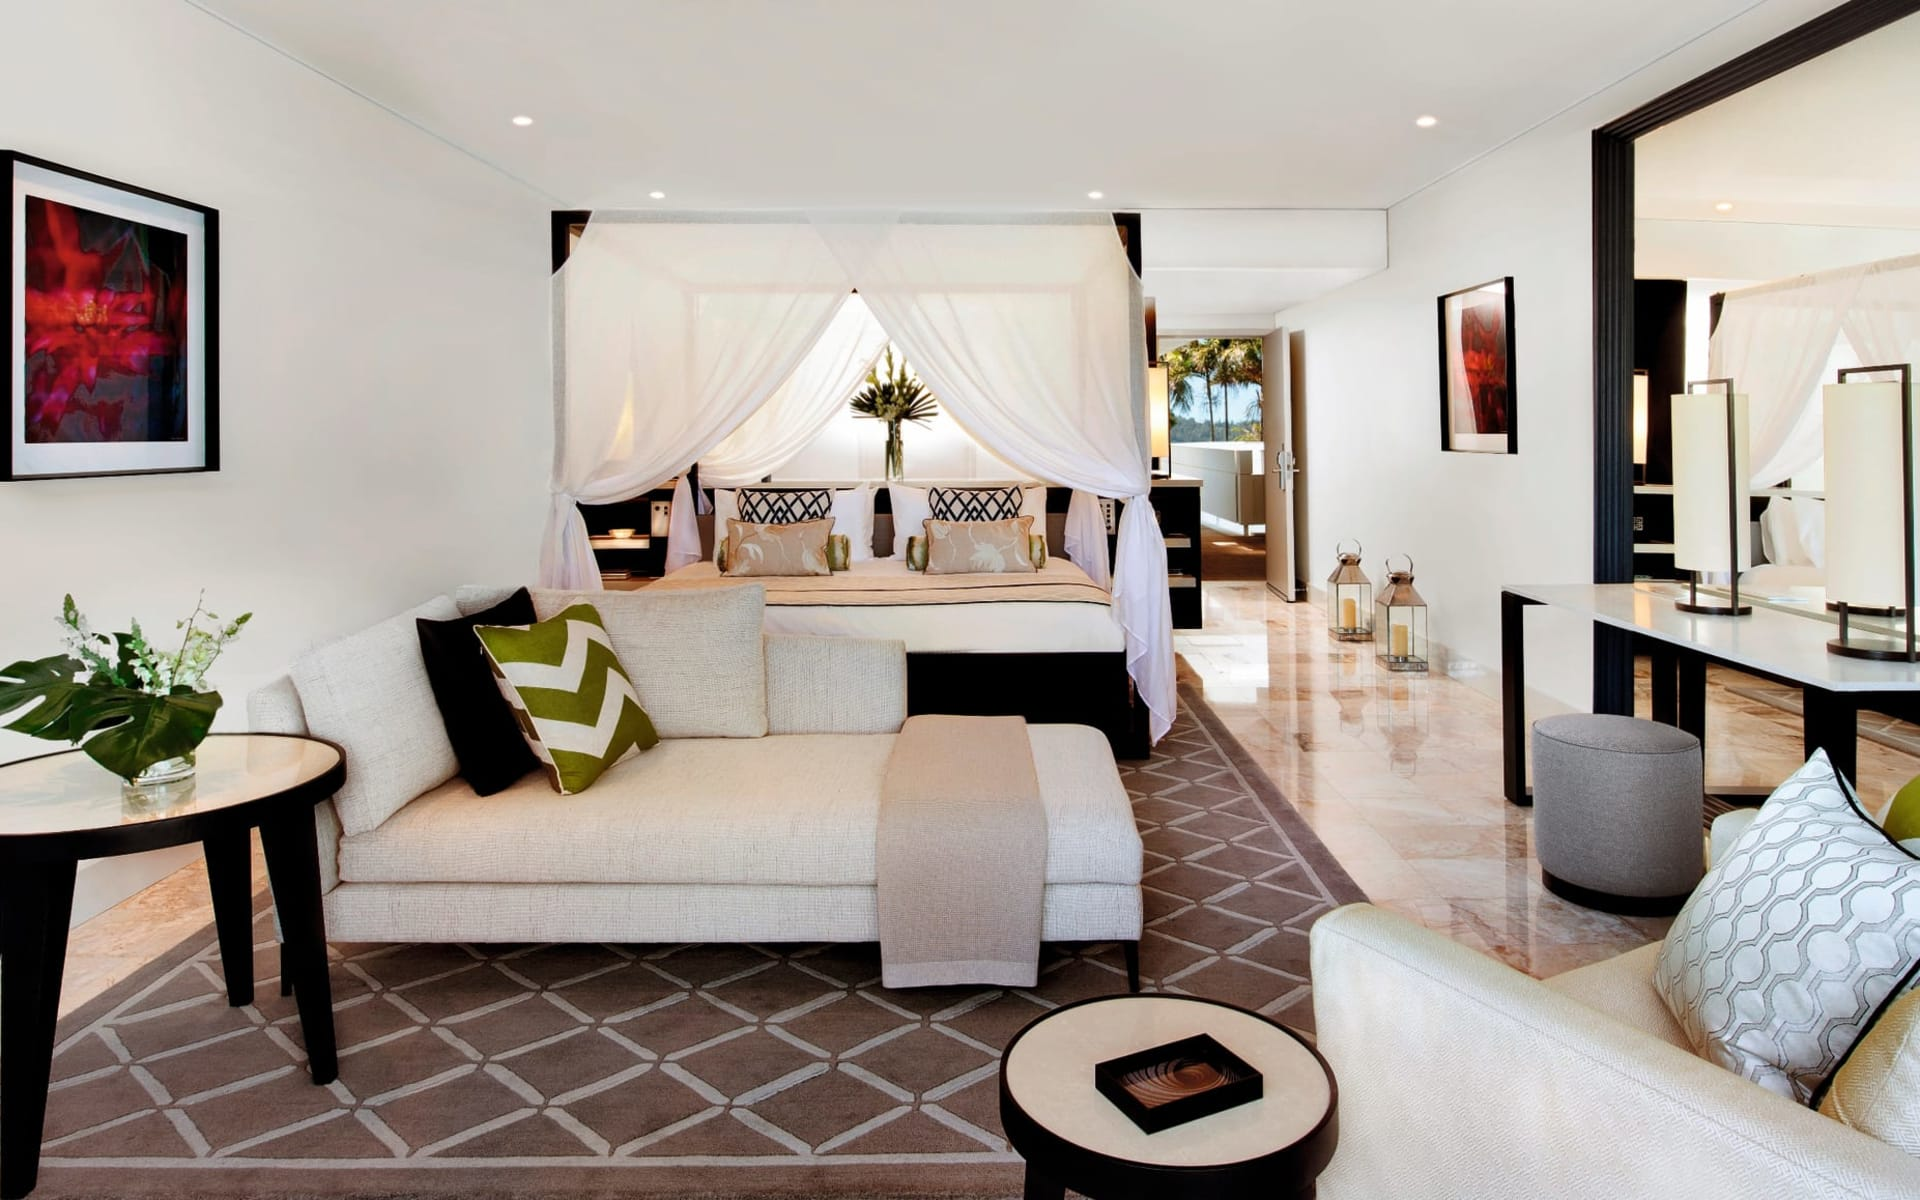 Intercontinental Hayman Island Resort:  One&Only Hayman Island - Lagoon Room